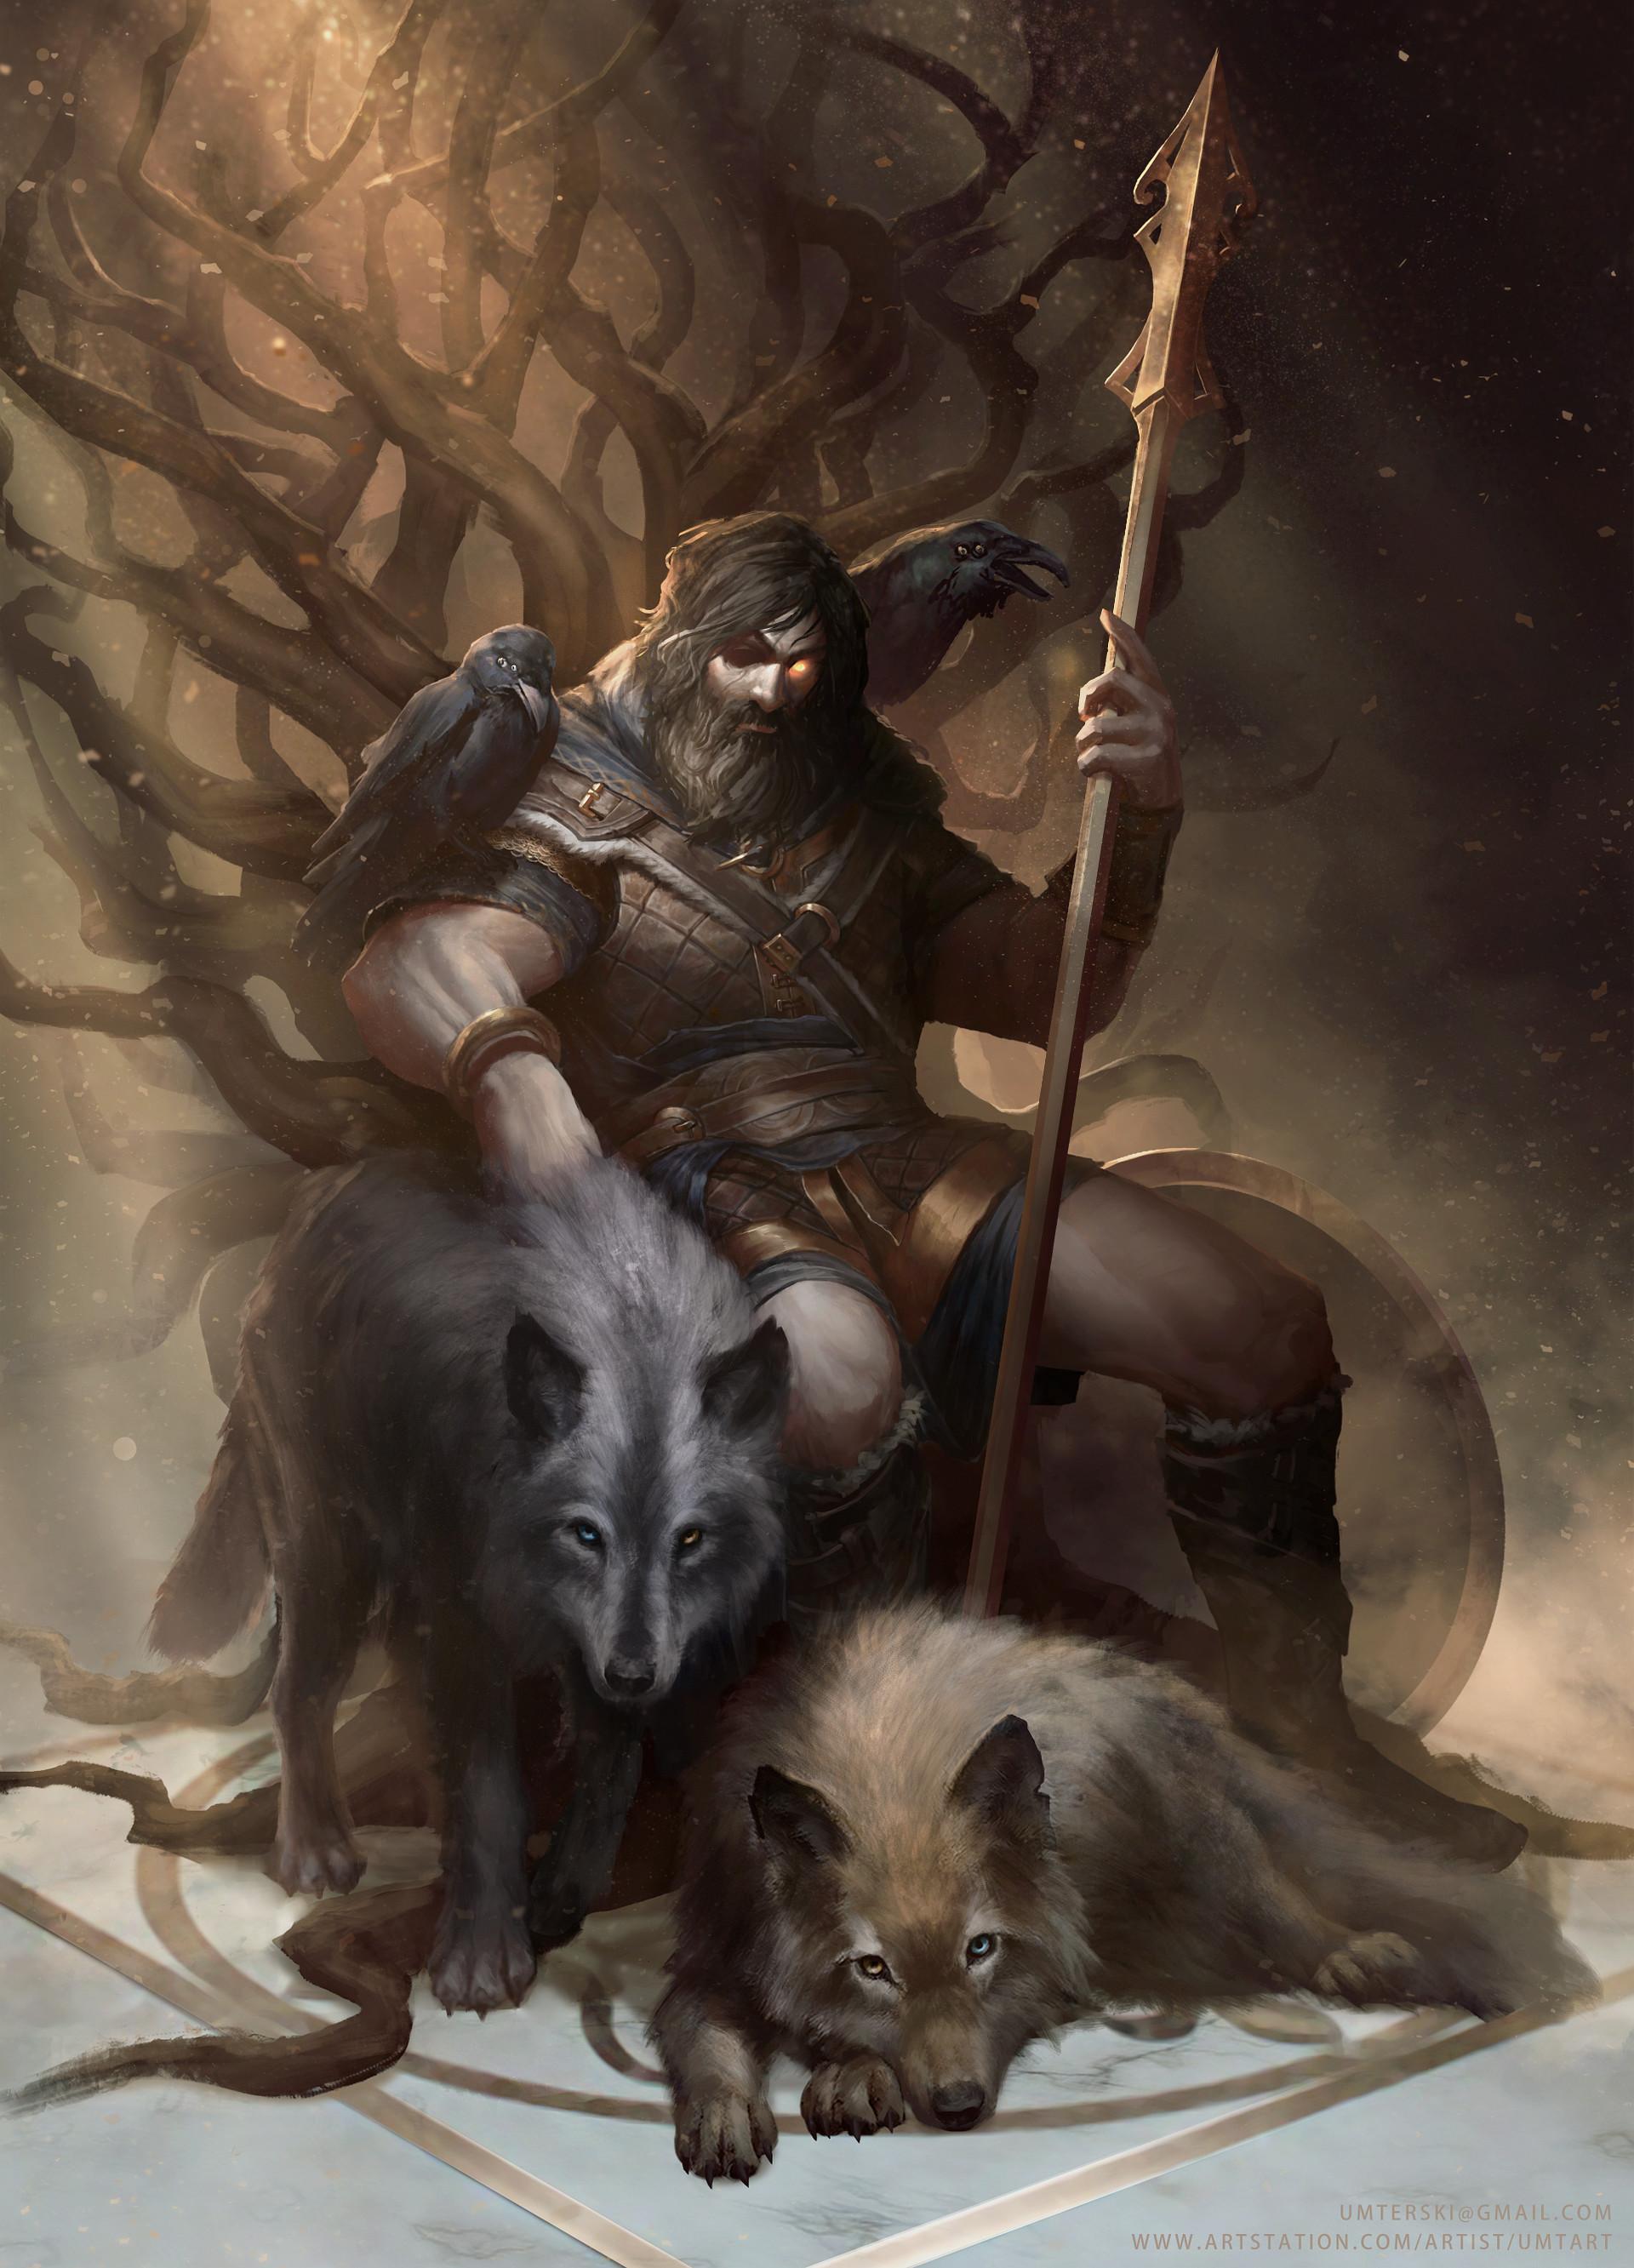 ArtStation - Odin The Allfather, Adam Wesierski